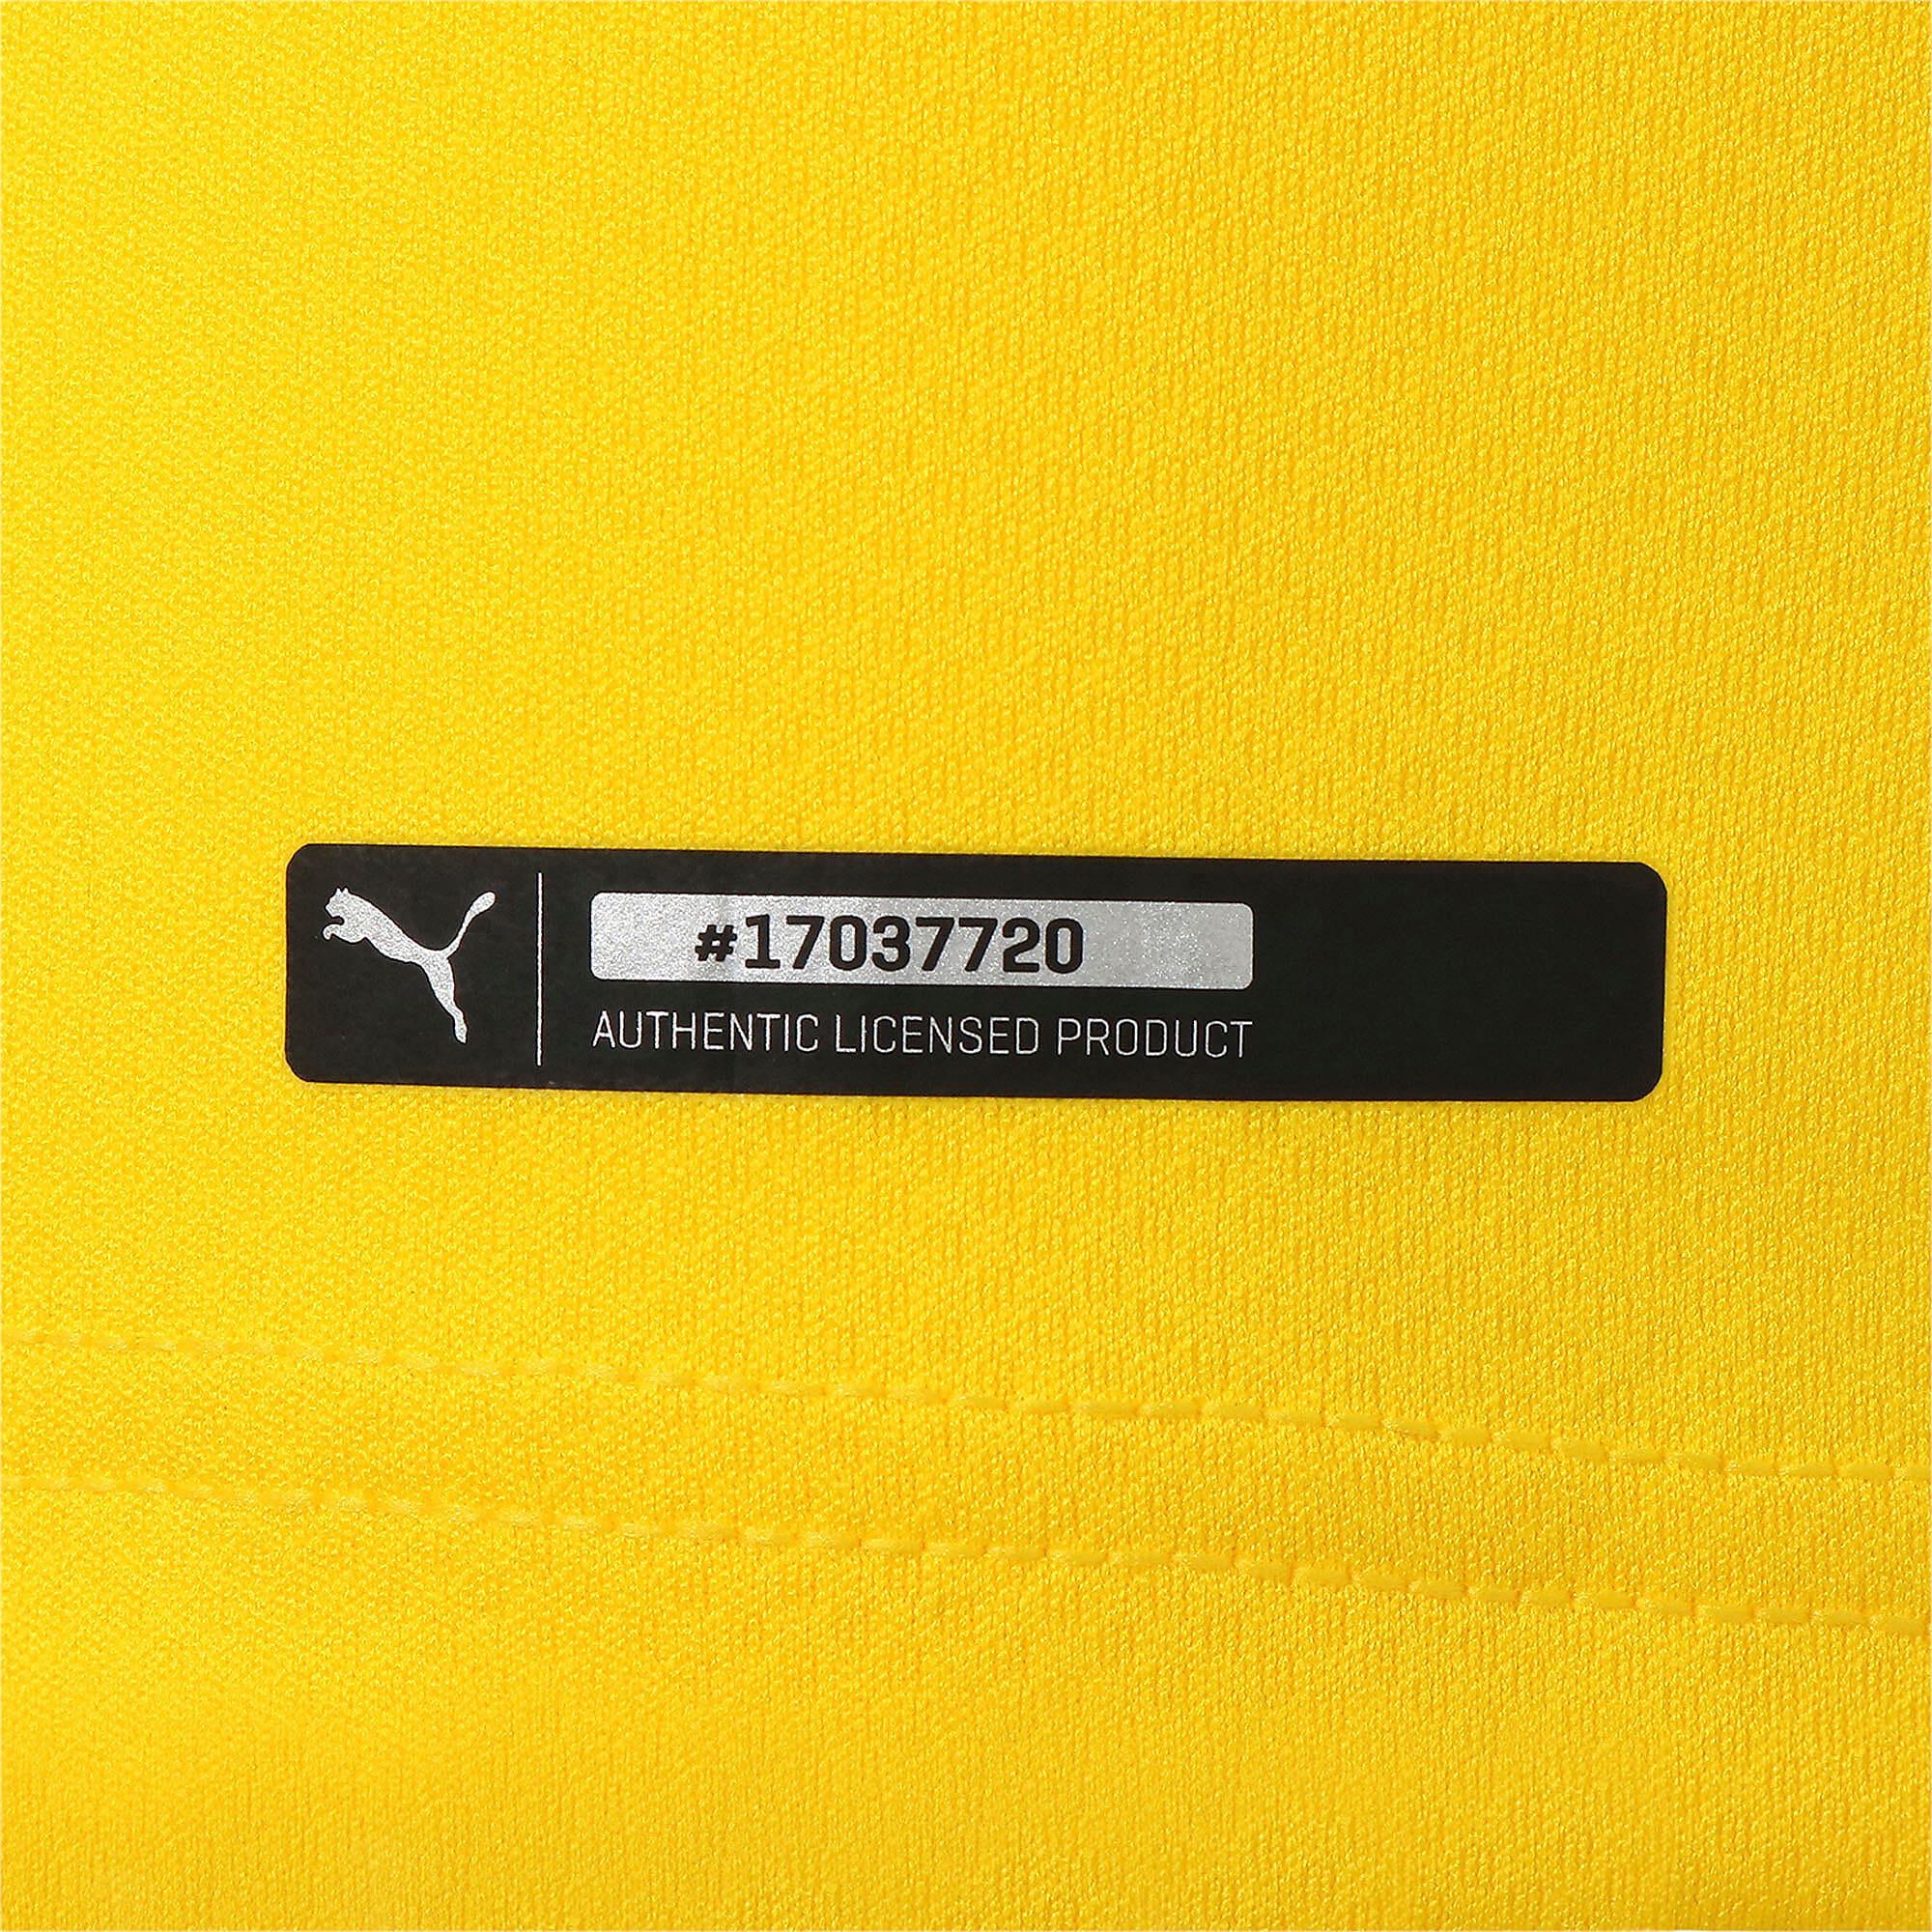 Thumbnail 11 of ドルトムント BVB SS カップ レプリカシャツ (半袖), Cyber Yellow-Puma Black, medium-JPN